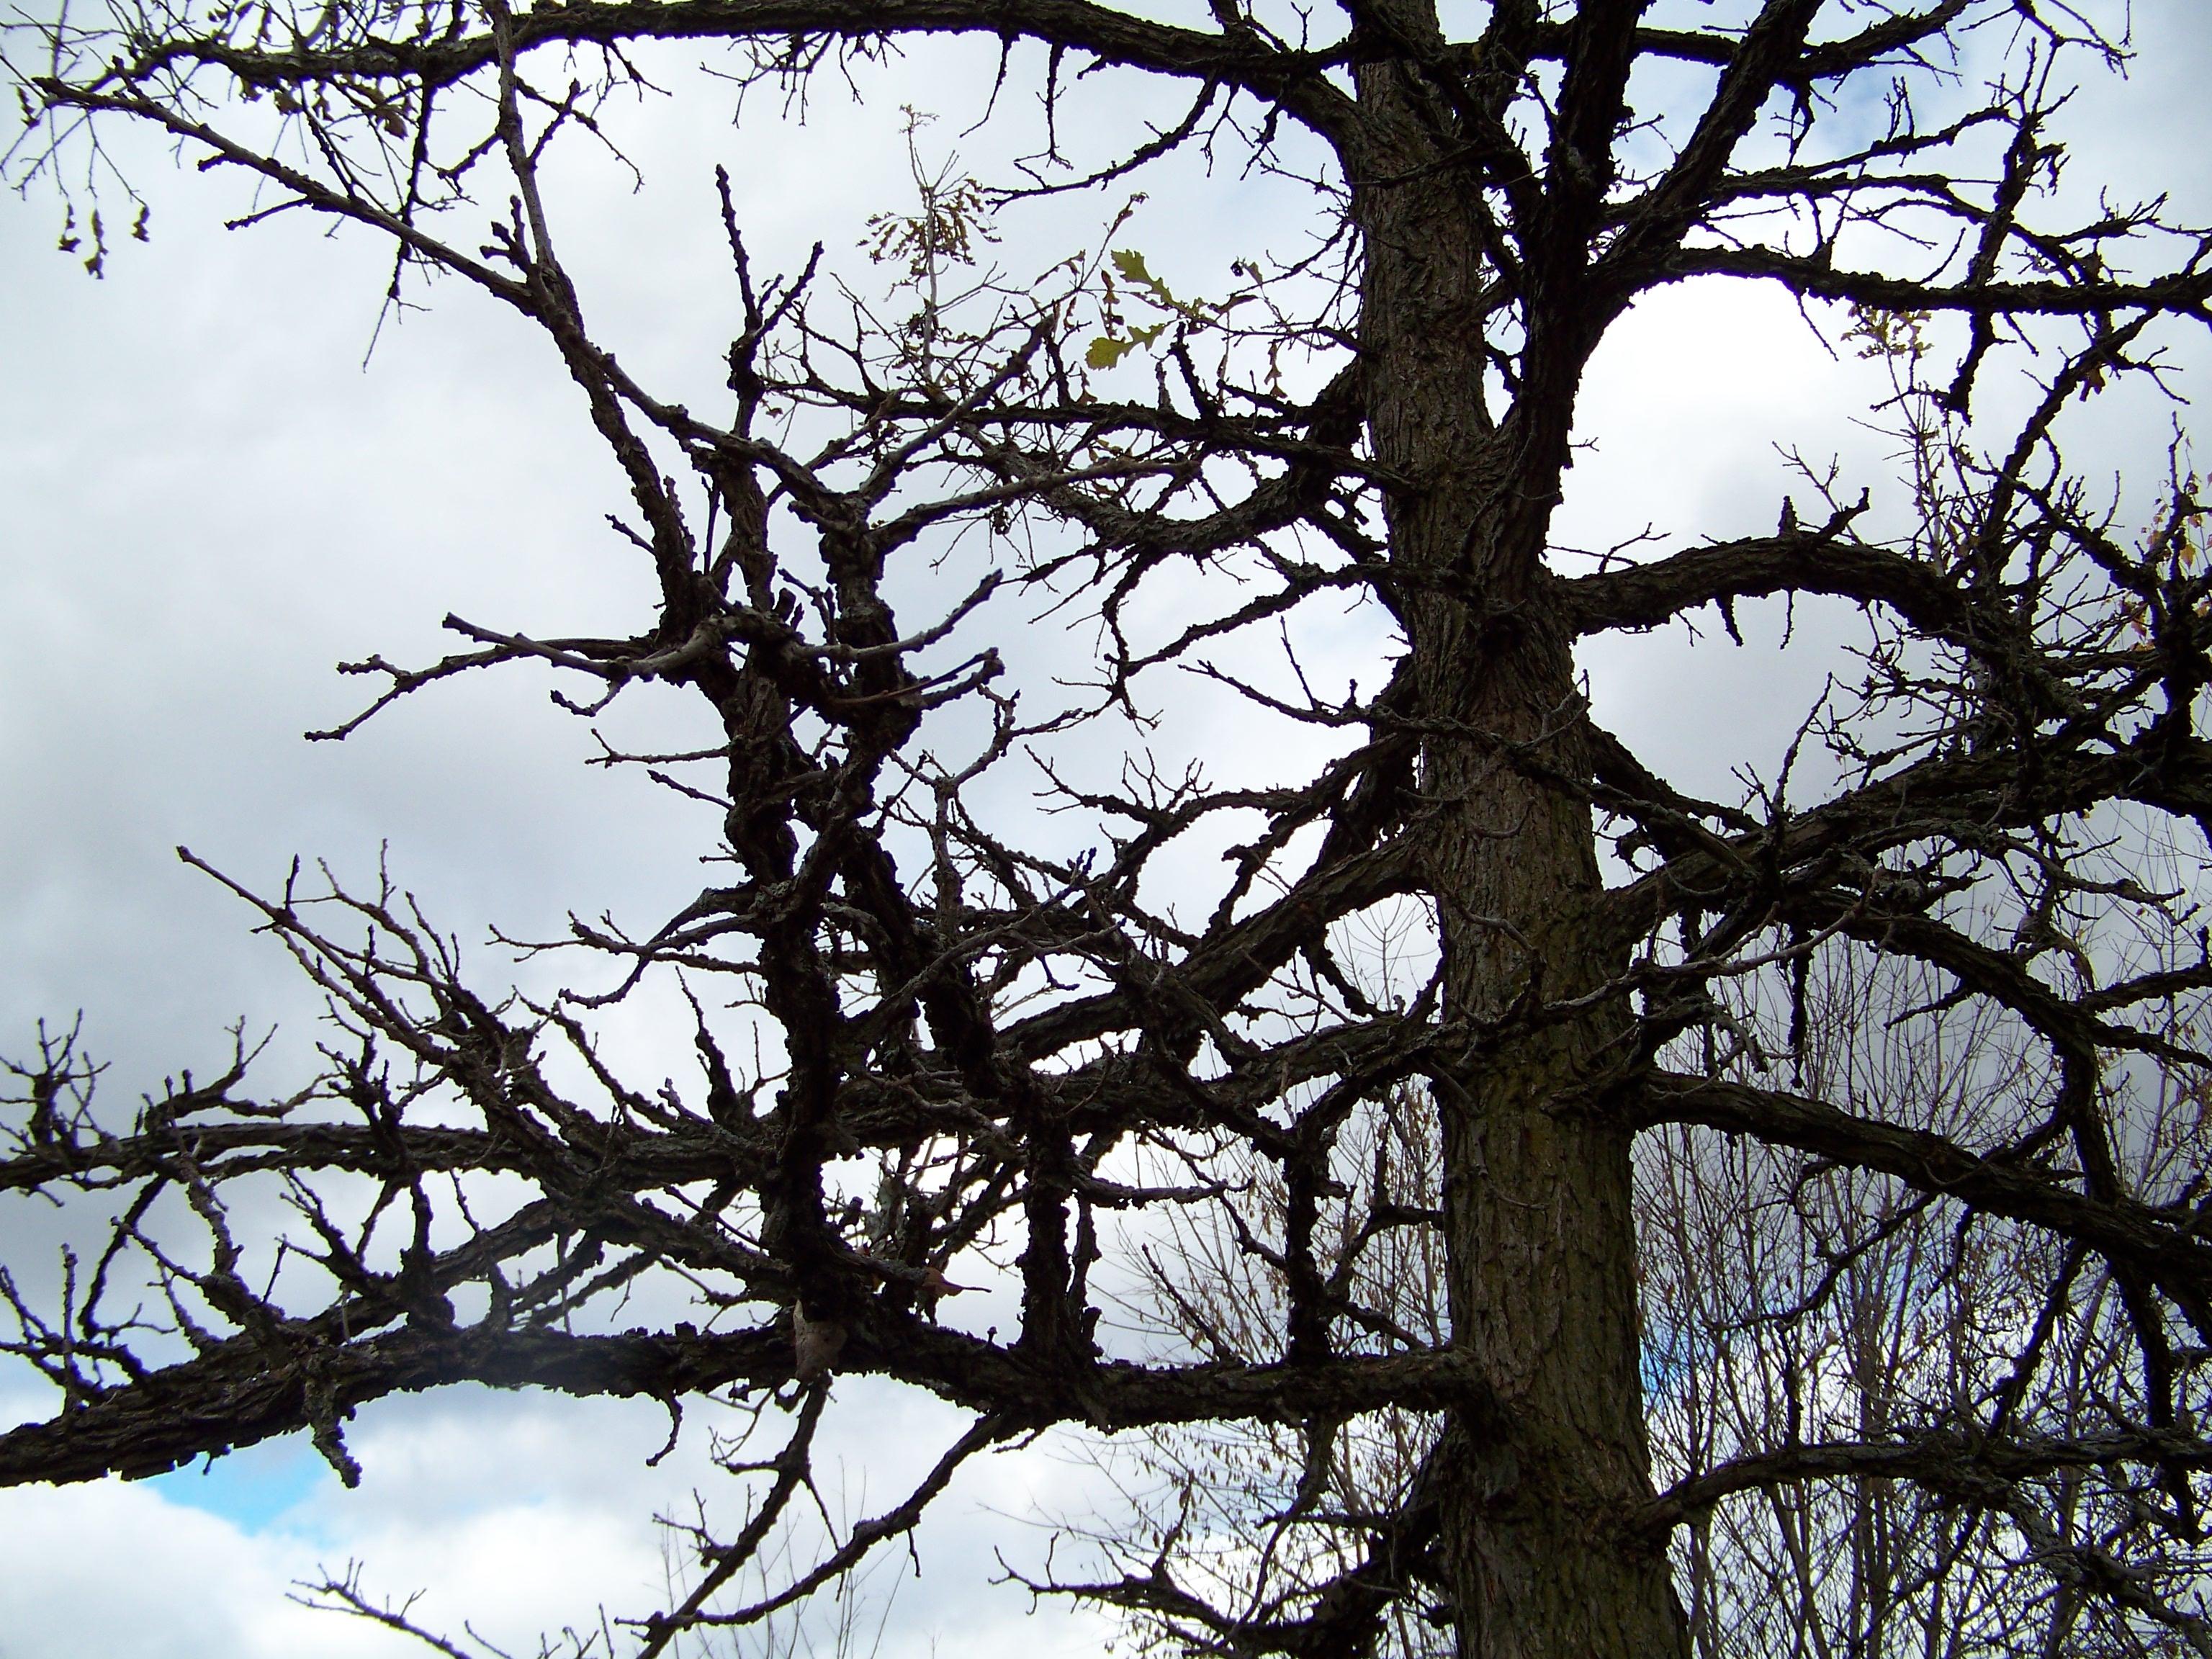 Magnificent Bur Oak Includes Prairies South From Manitoba Westto Where It Is A Savannah A Savannah Is A Grassland Range Bur Oak Willow House Chronicles houzz-03 Burr Oak Tree